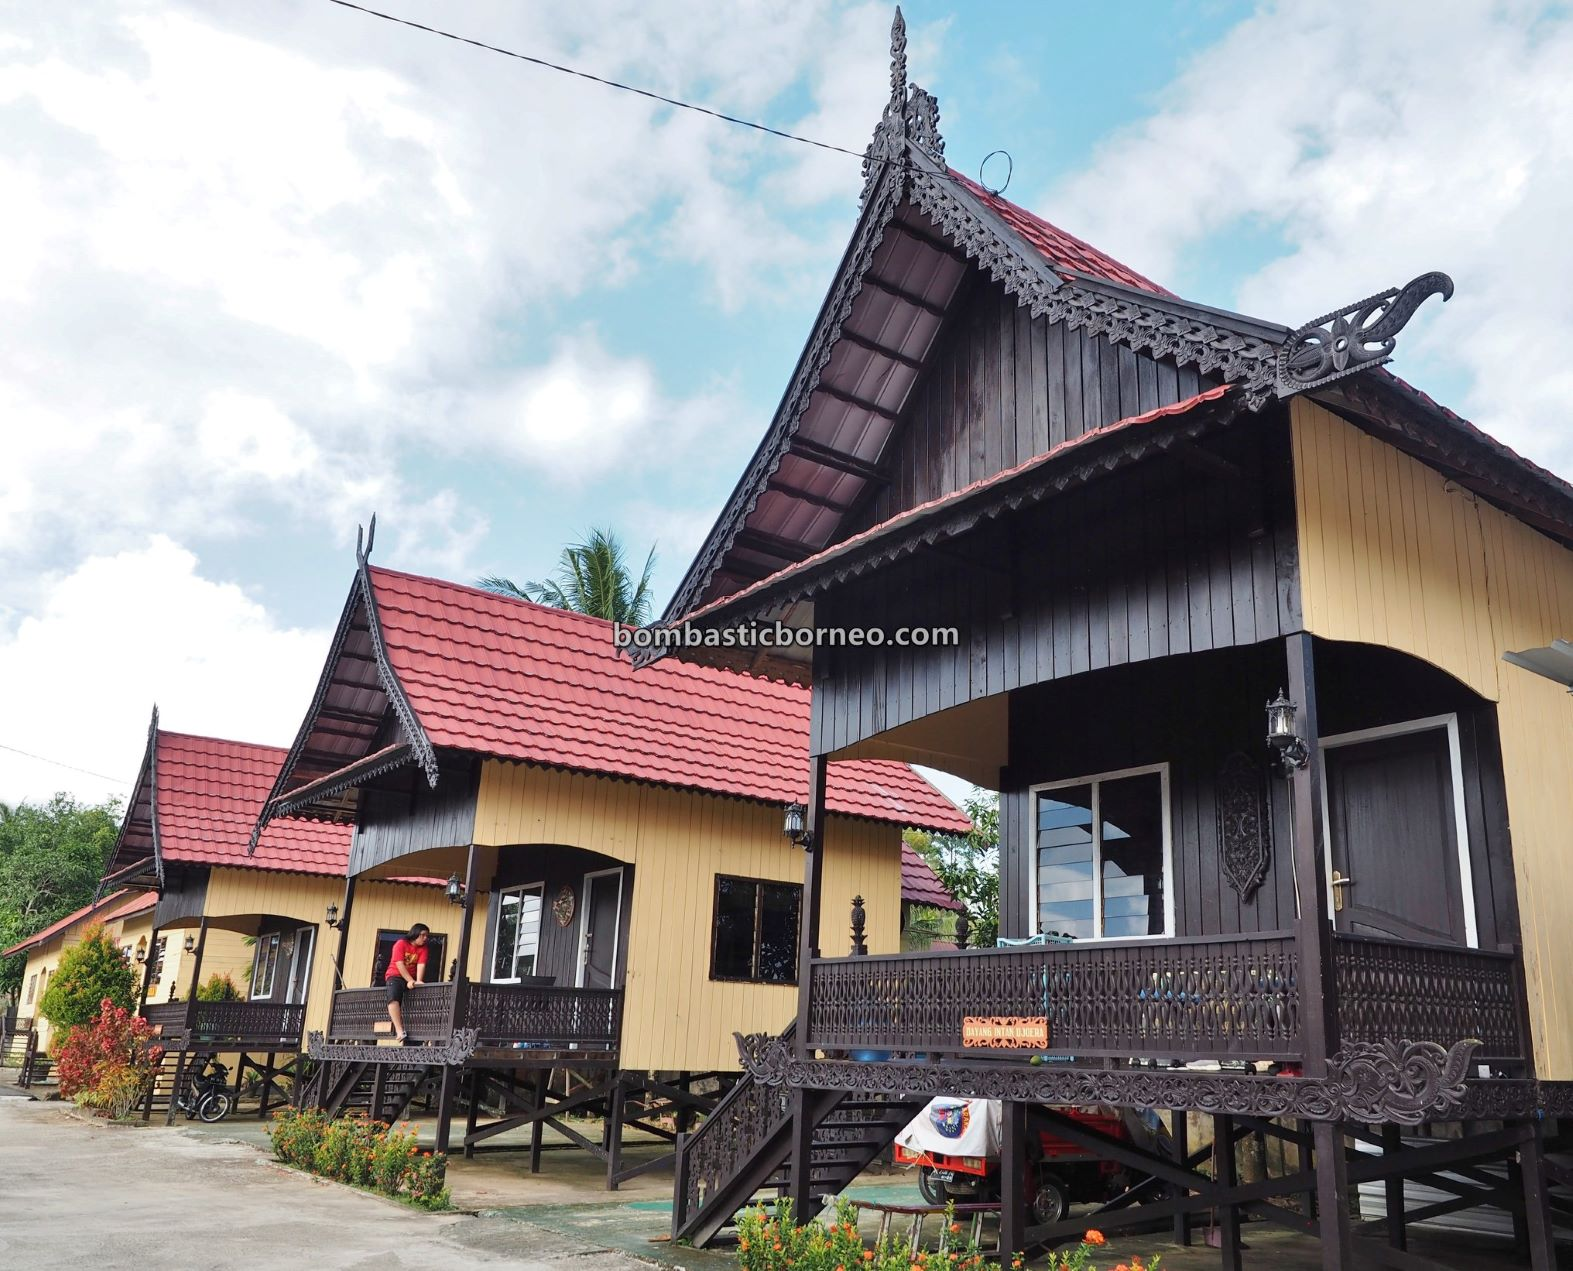 Rumah Baloy Mayo Adat Tidung, Heritage Centre, culture, authentic, traditional, native, backpackers, destination, Pariwisata, Tourist attraction, travel guide, Trans Border, Borneo, 印尼北加里曼丹, 打拉根岛旅游景点